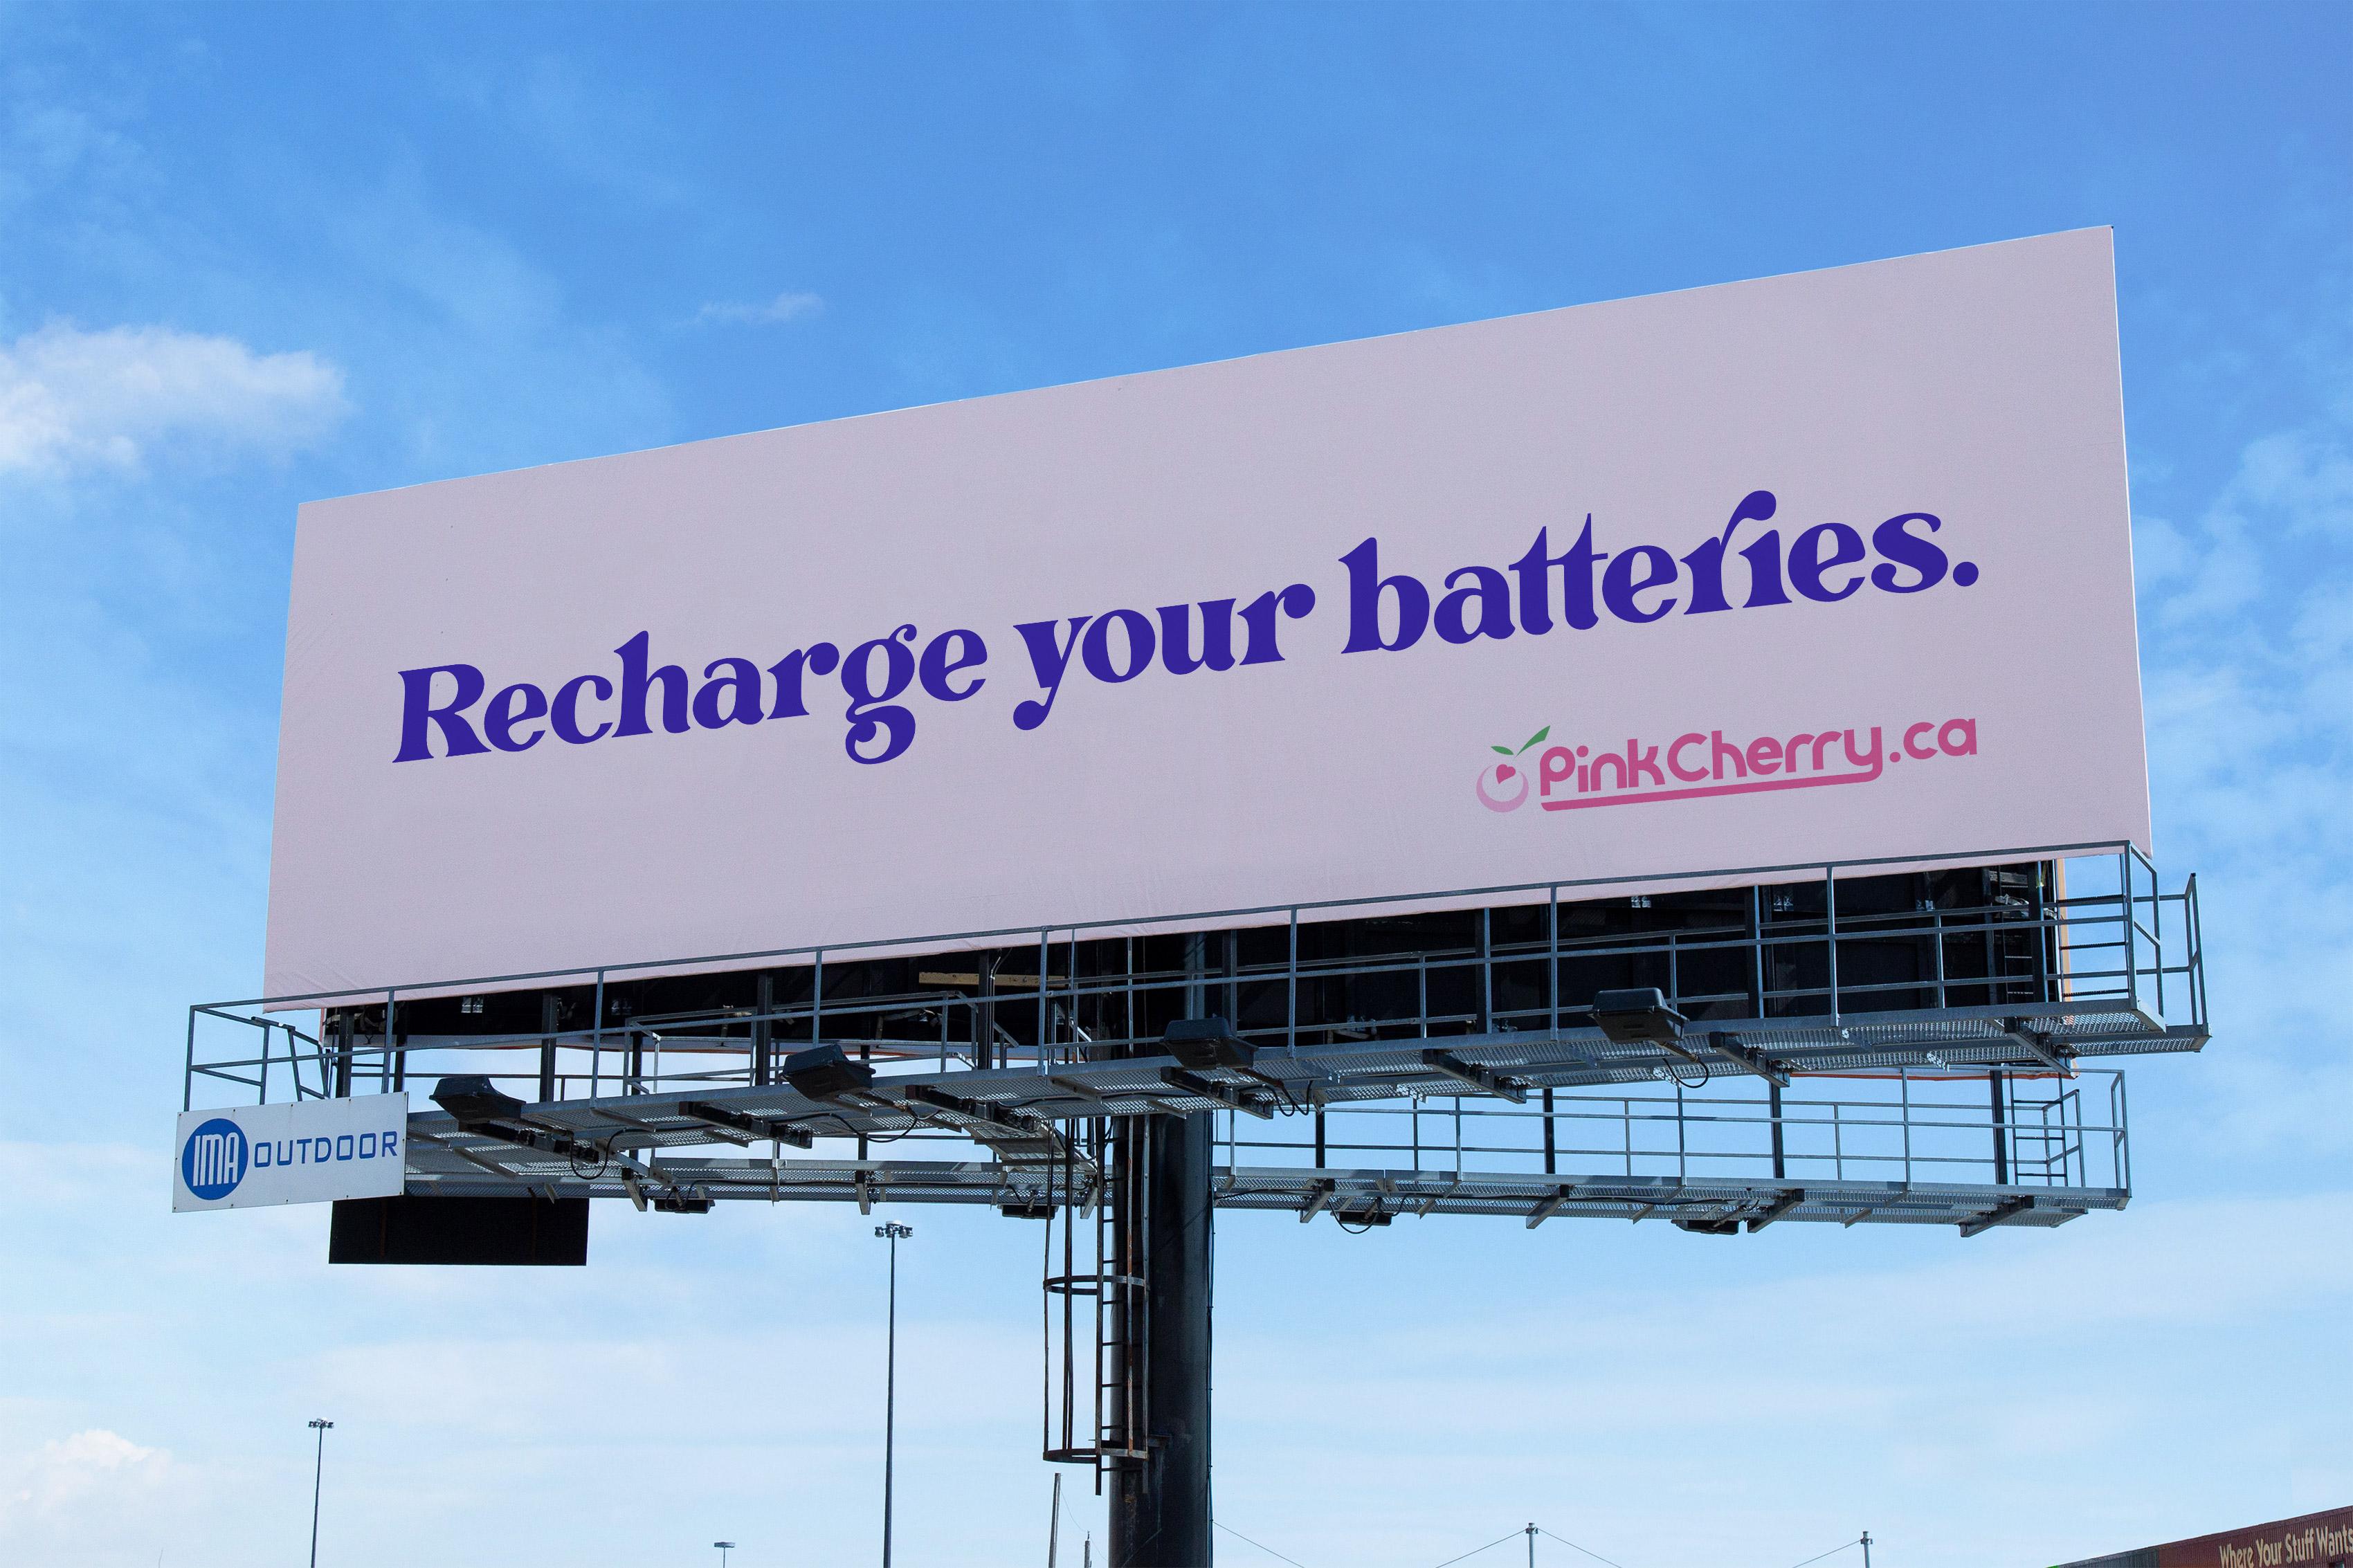 PC_Recharge